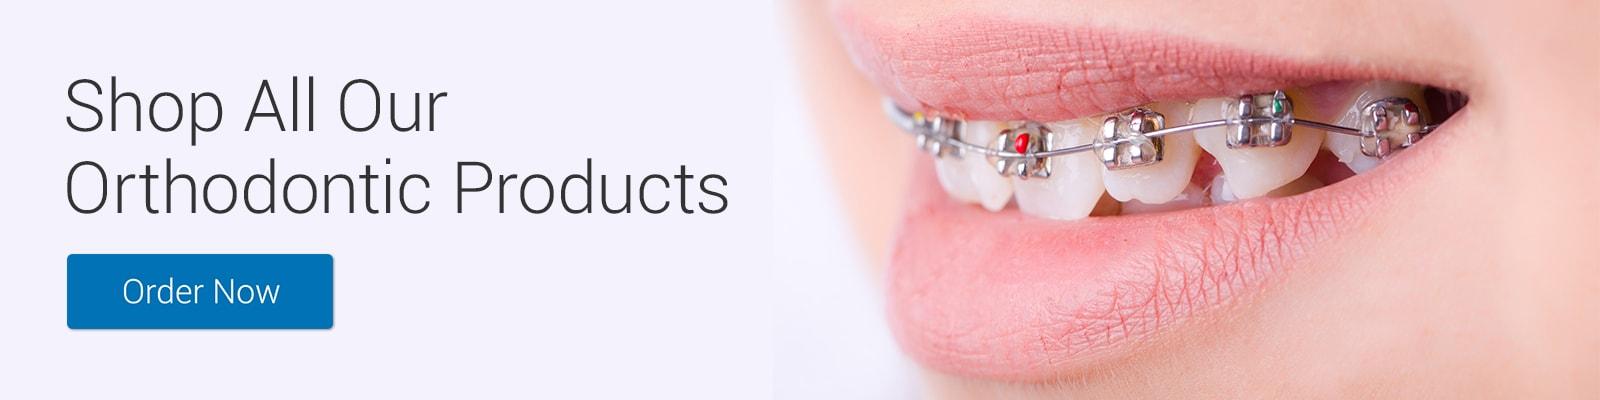 Orthodontics Supplies & Tools   Henry Schein Dental